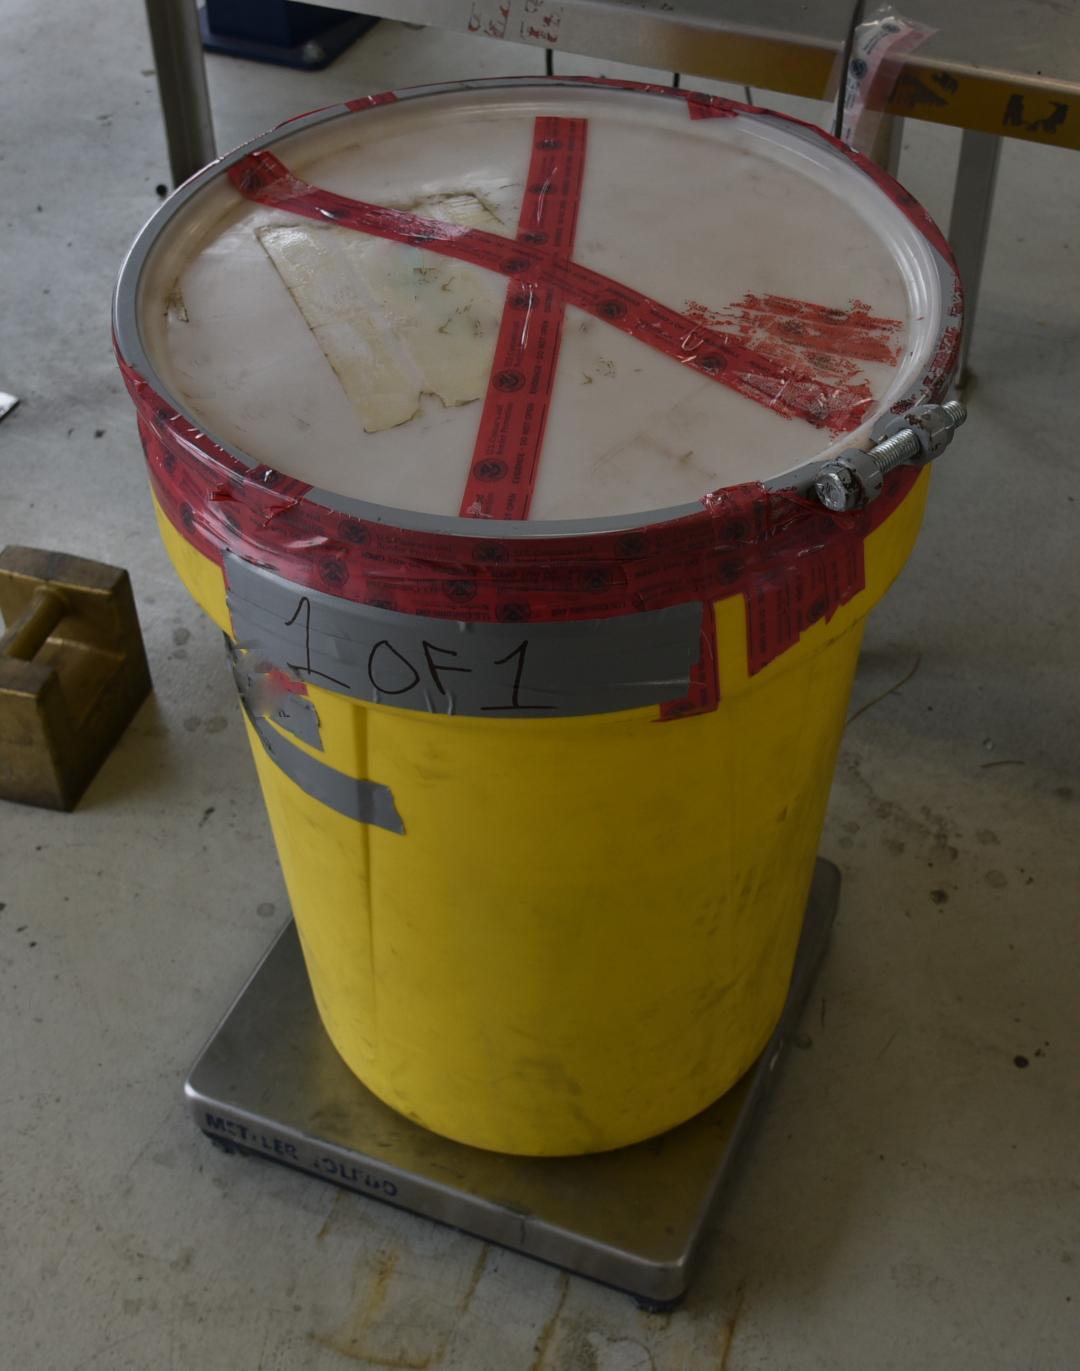 Incautan metanfetamina por 2.5 MDD en Laredo, Texas